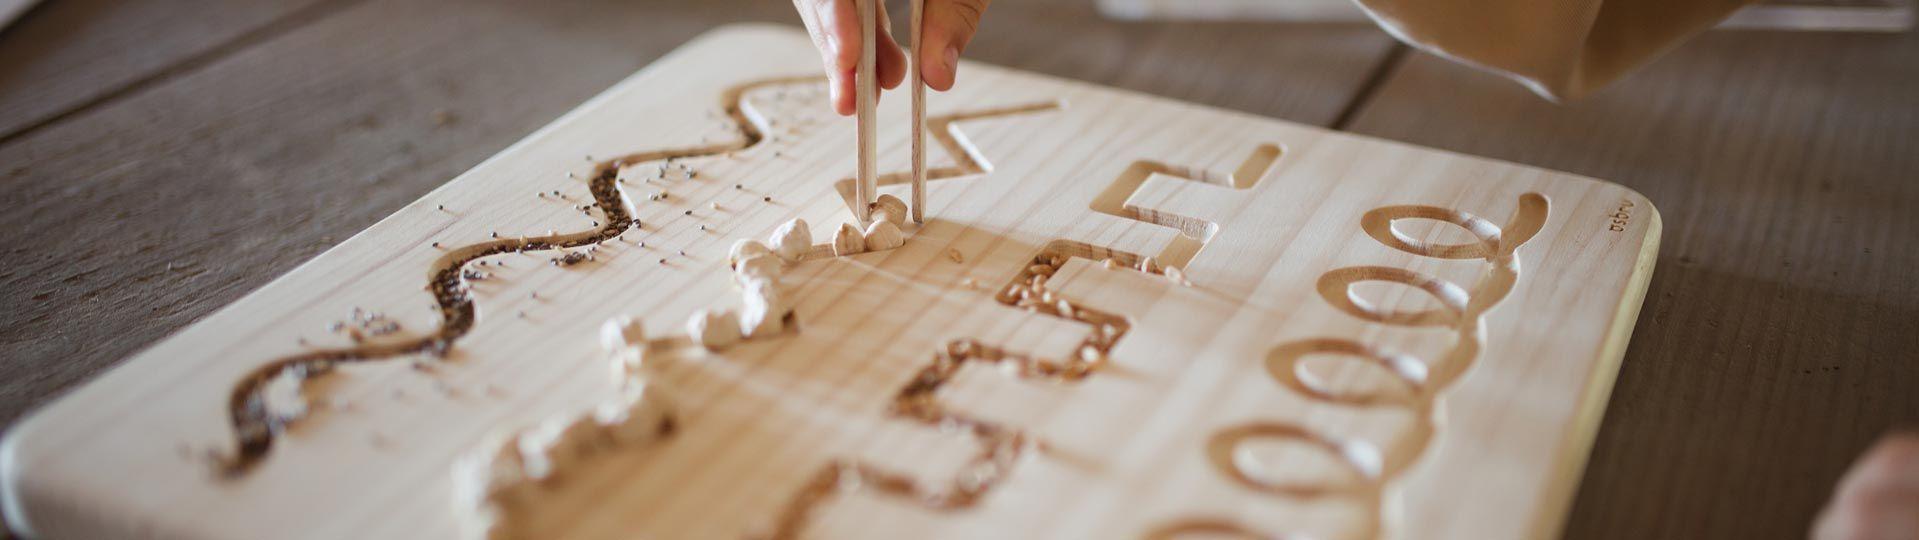 Juguetes Montessori - Aúpa Organics